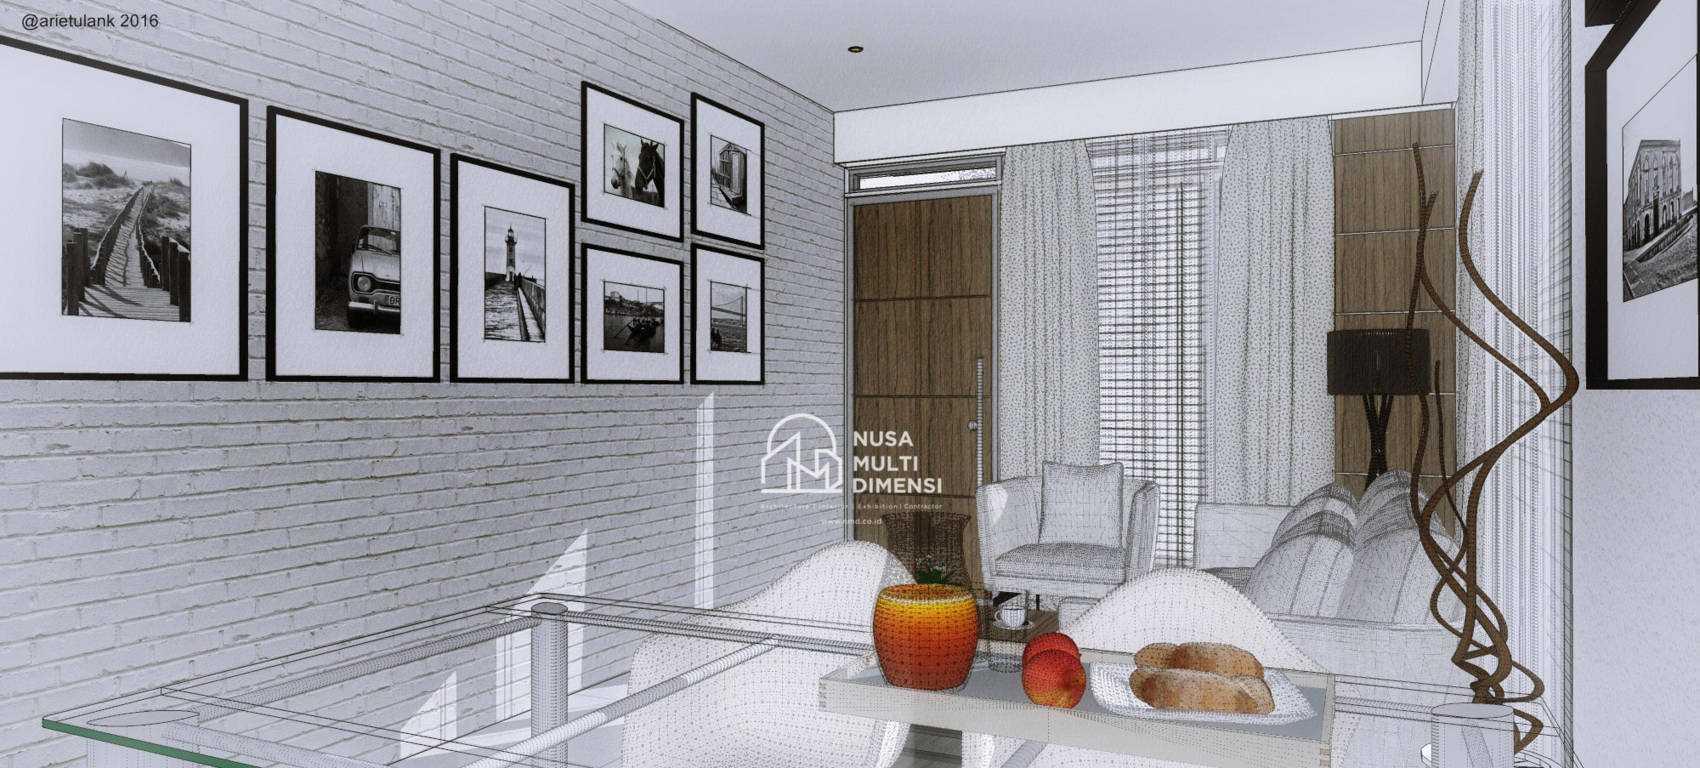 Nusa Multi Dimensi Desain Rumah Taman Mutiara Cibinong Bogor Cibinong, Bogor, Jawa Barat, Indonesia Cibinong, Bogor, Jawa Barat, Indonesia Nusa-Multi-Dimensi-Desain-Rumah-Taman-Mutiara-Cibinong-Bogor  92403